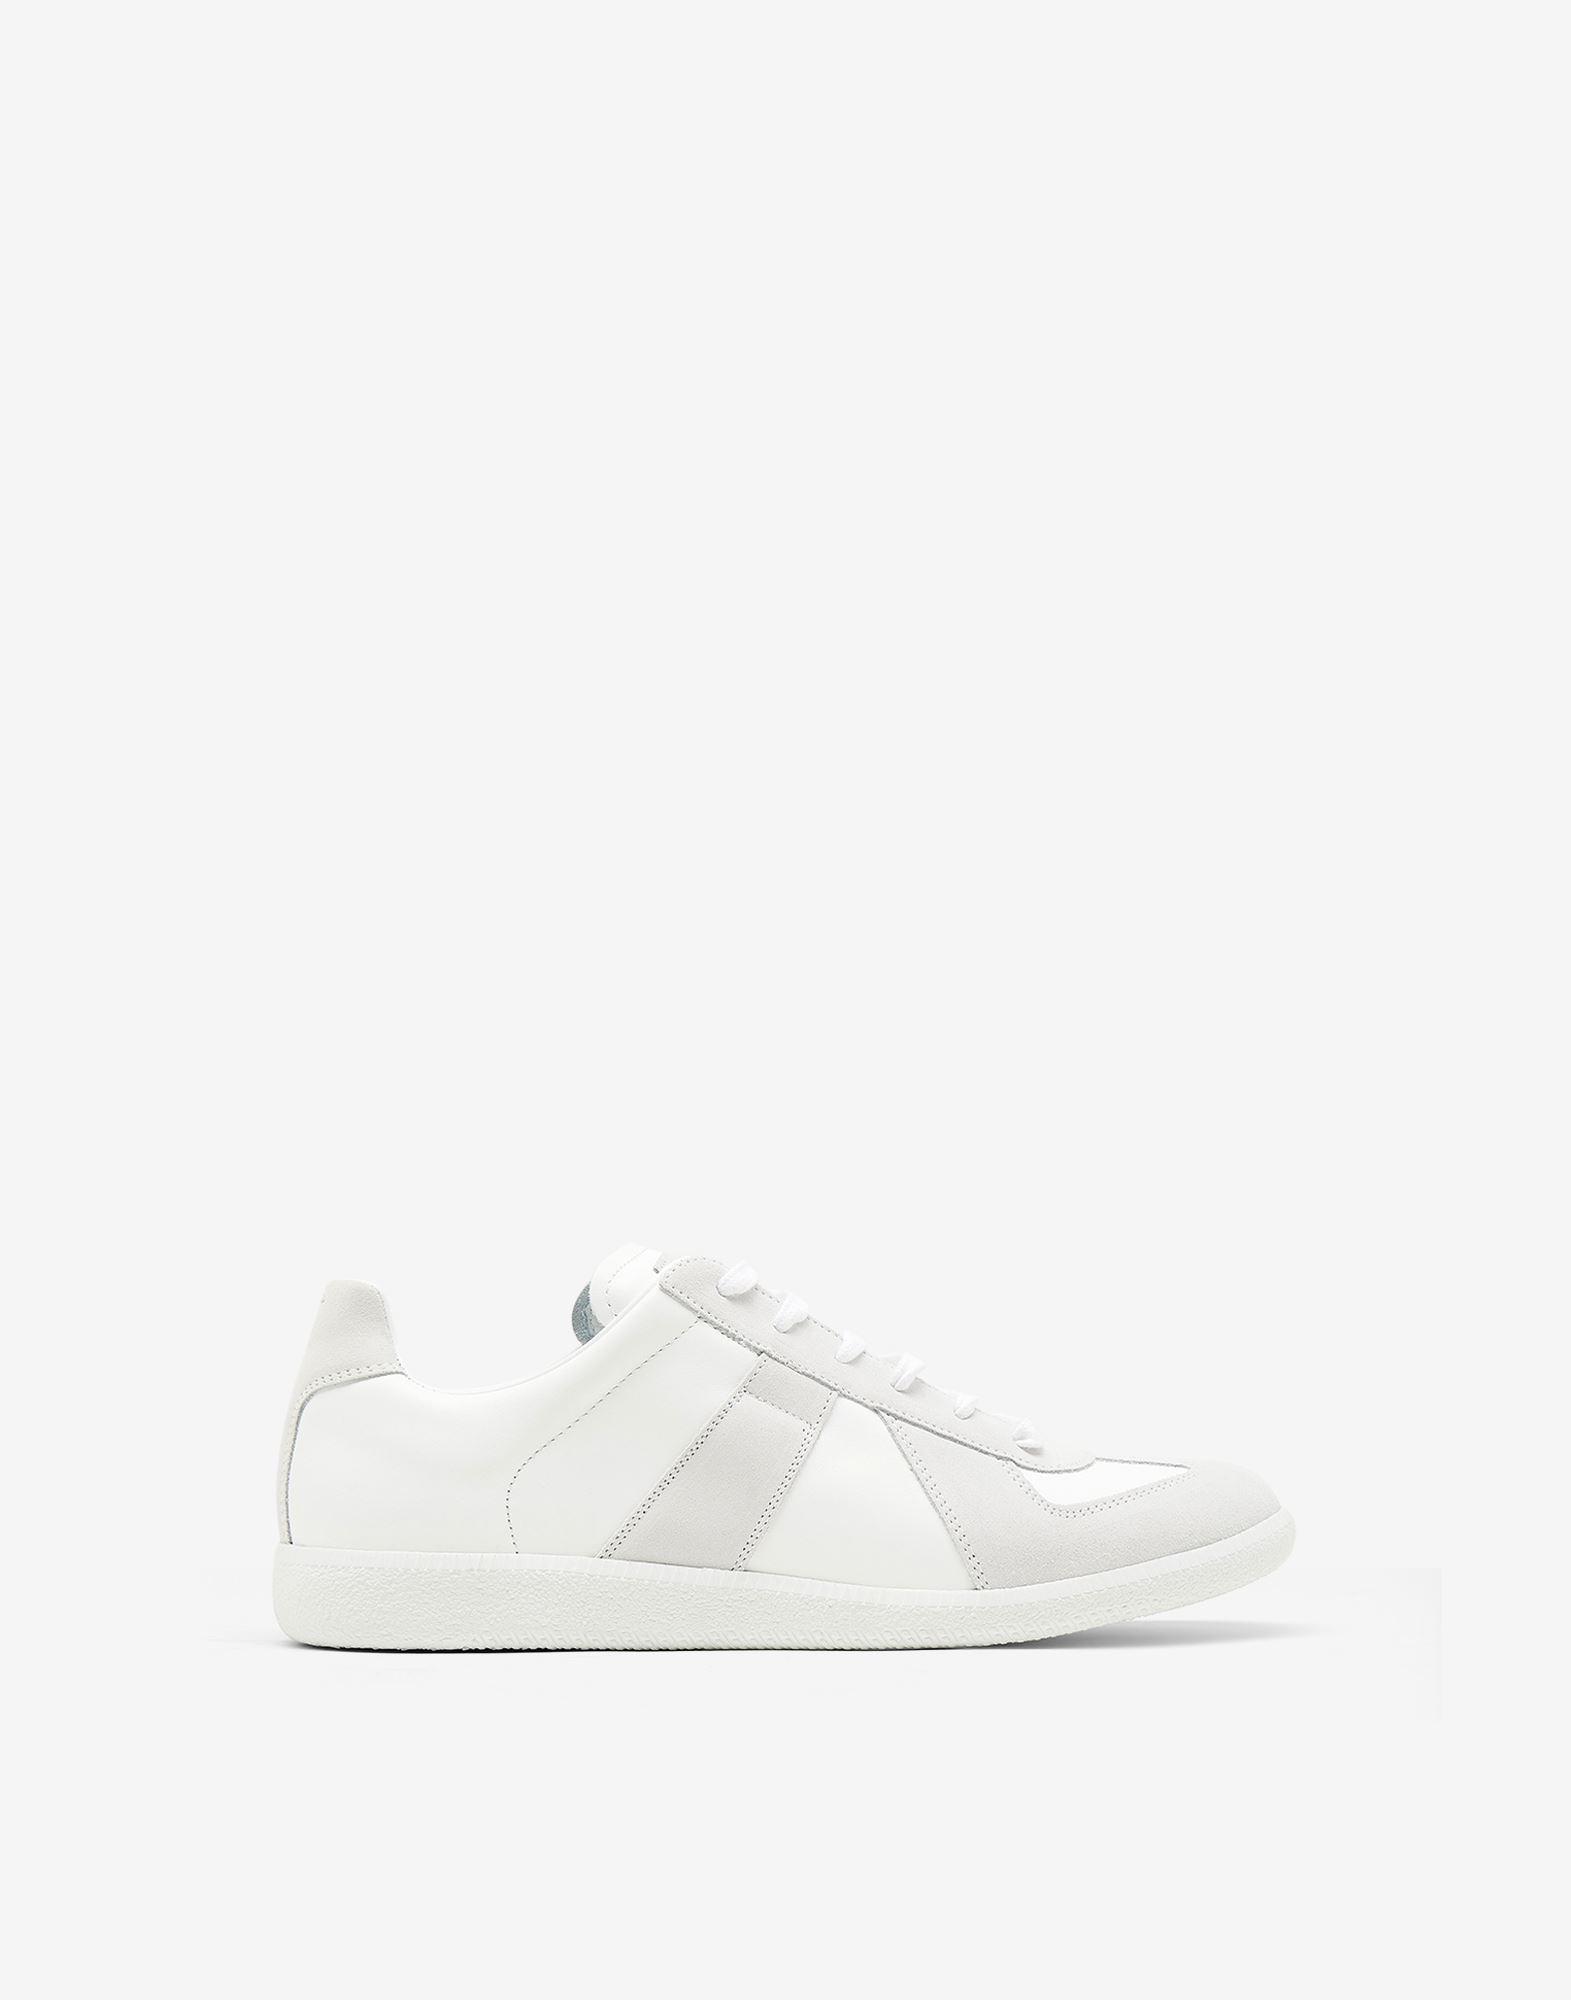 MAISON MARGIELA Calfskin 'Replica' sneaker Sneakers Man f